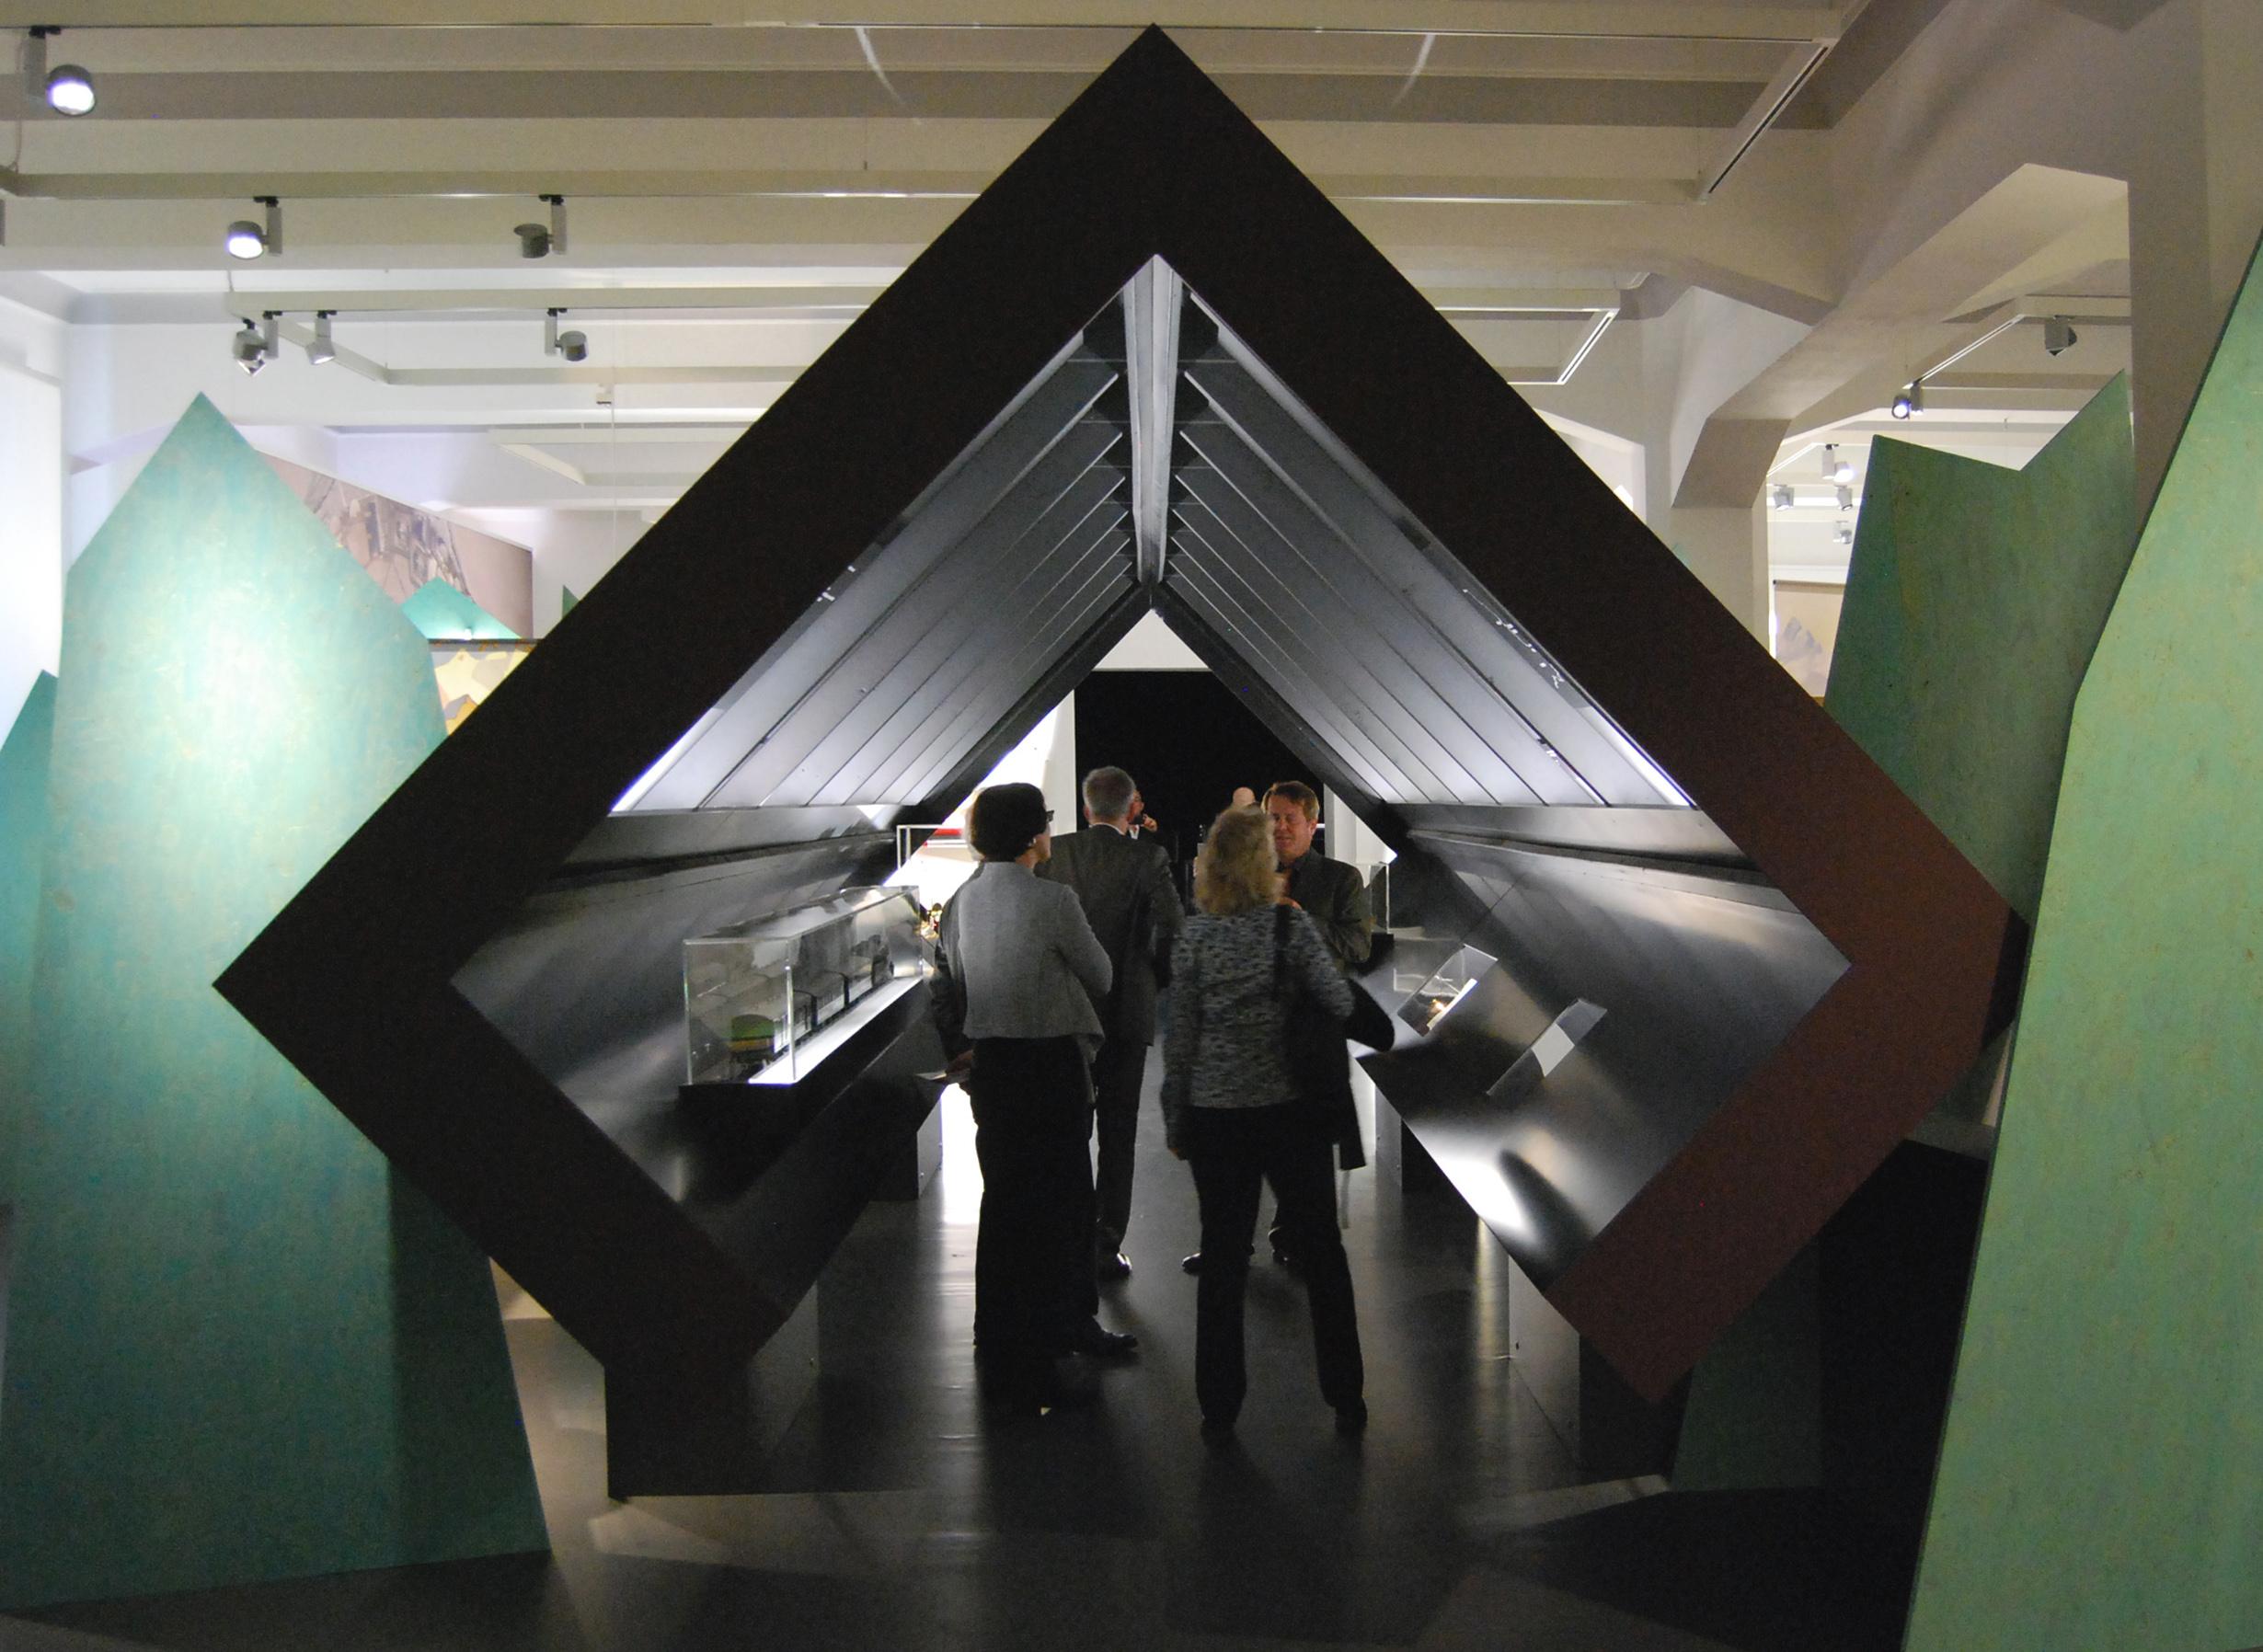 kwod_Ausstellung_Deutsch e Bahn_Museum_Nürnberg_Sonderausstellung_Planet_Railway_Schweiz_Tunnel